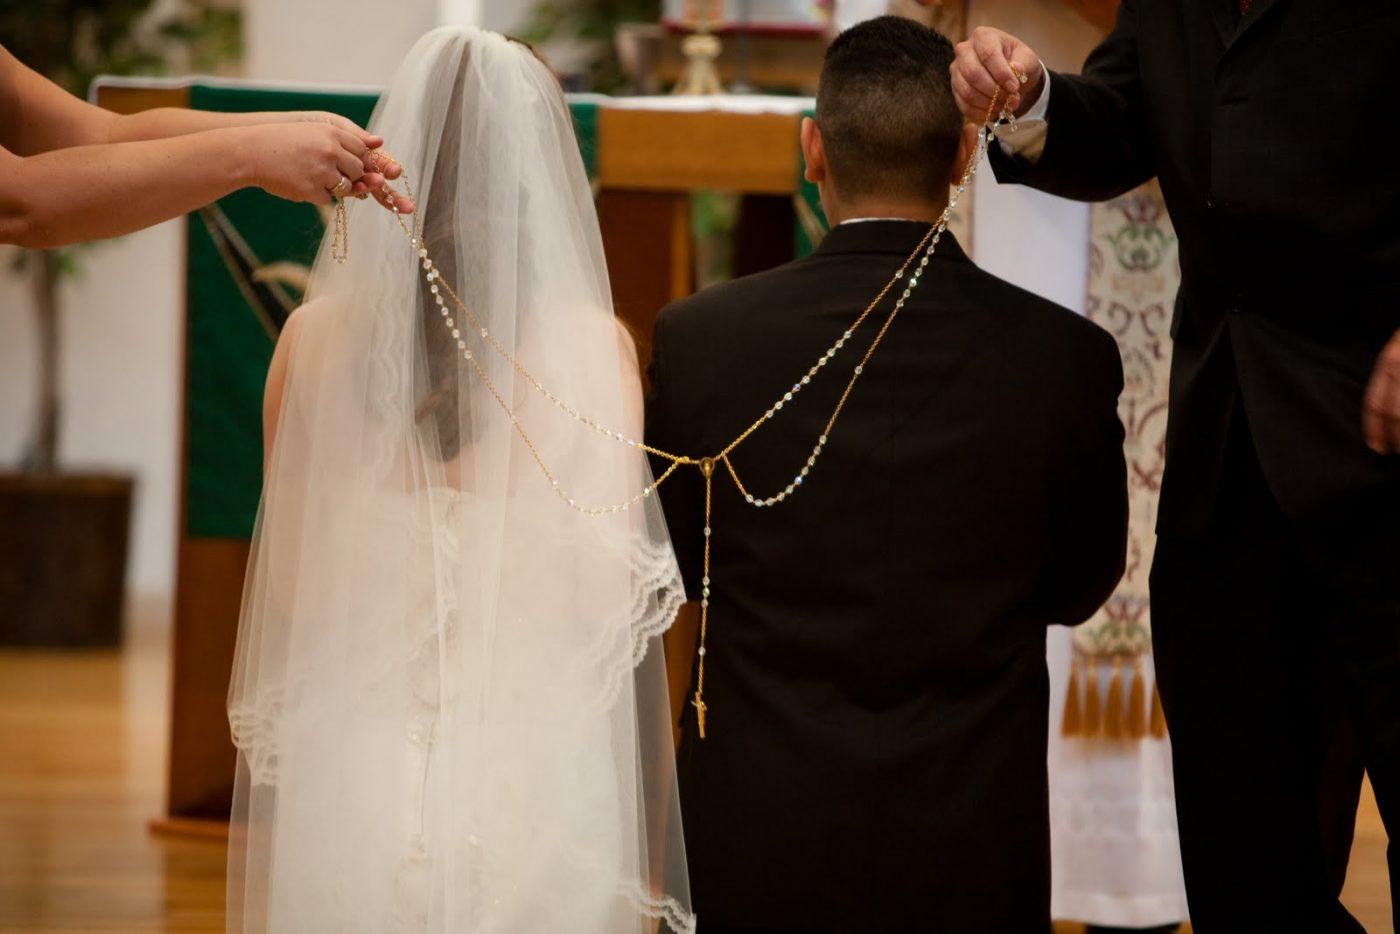 Spanish marriage customs